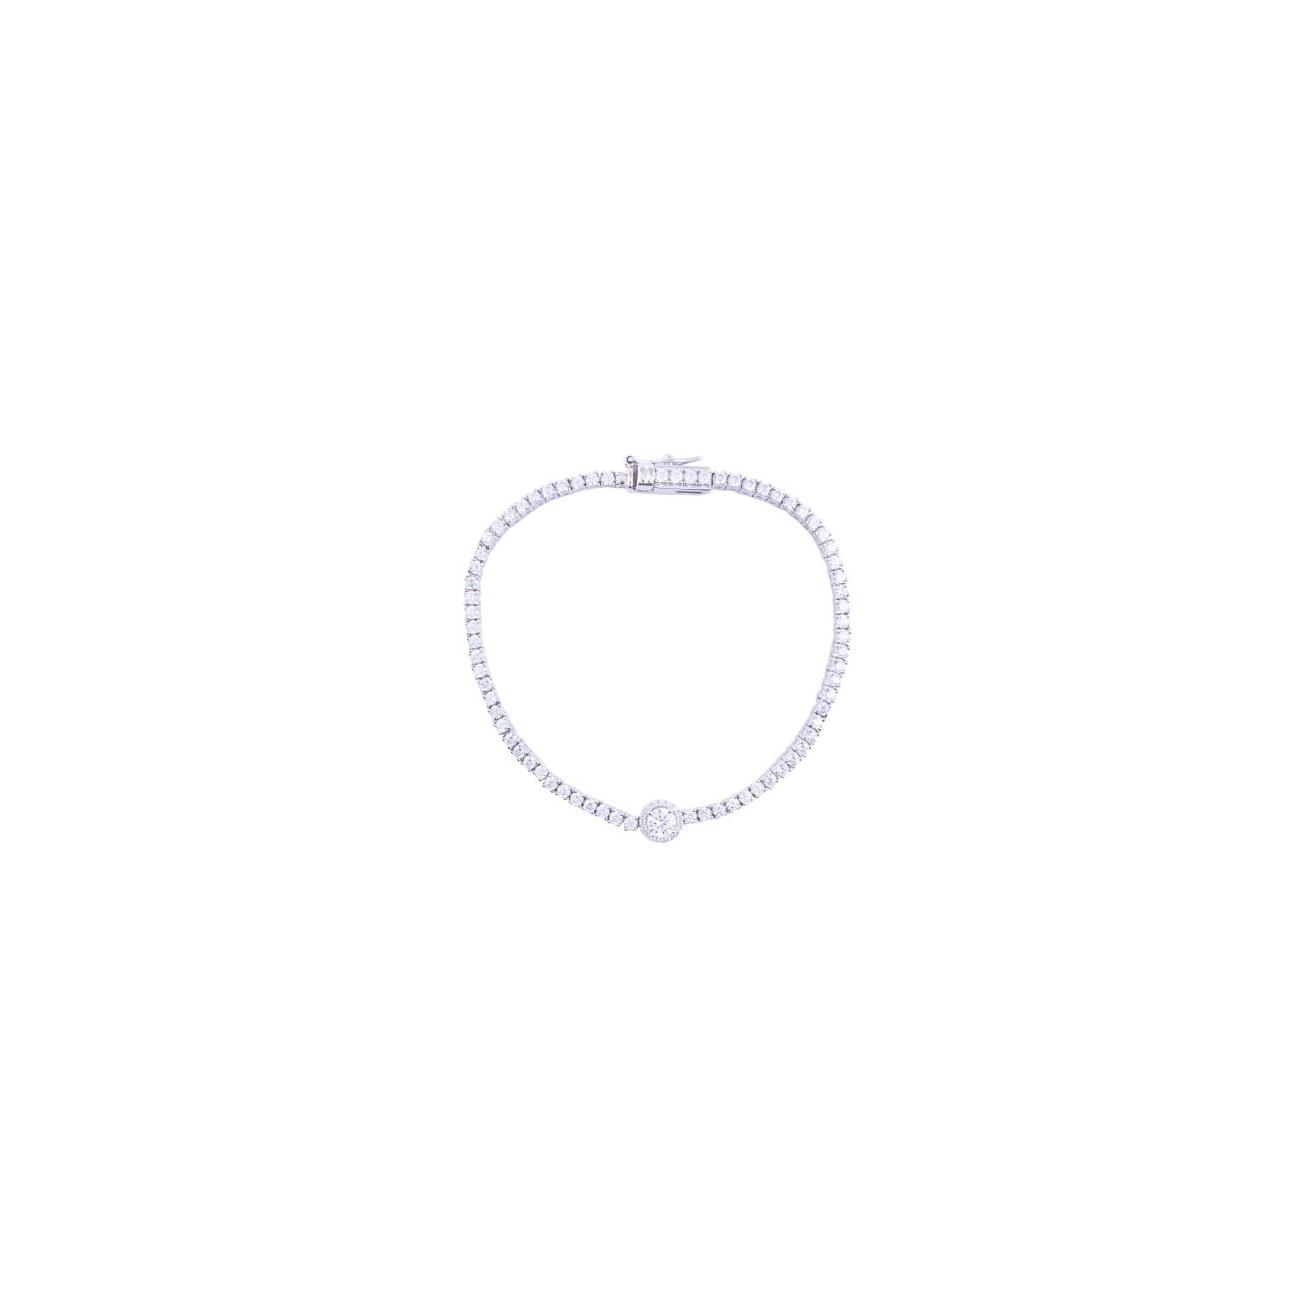 Tennis bracelet with central element